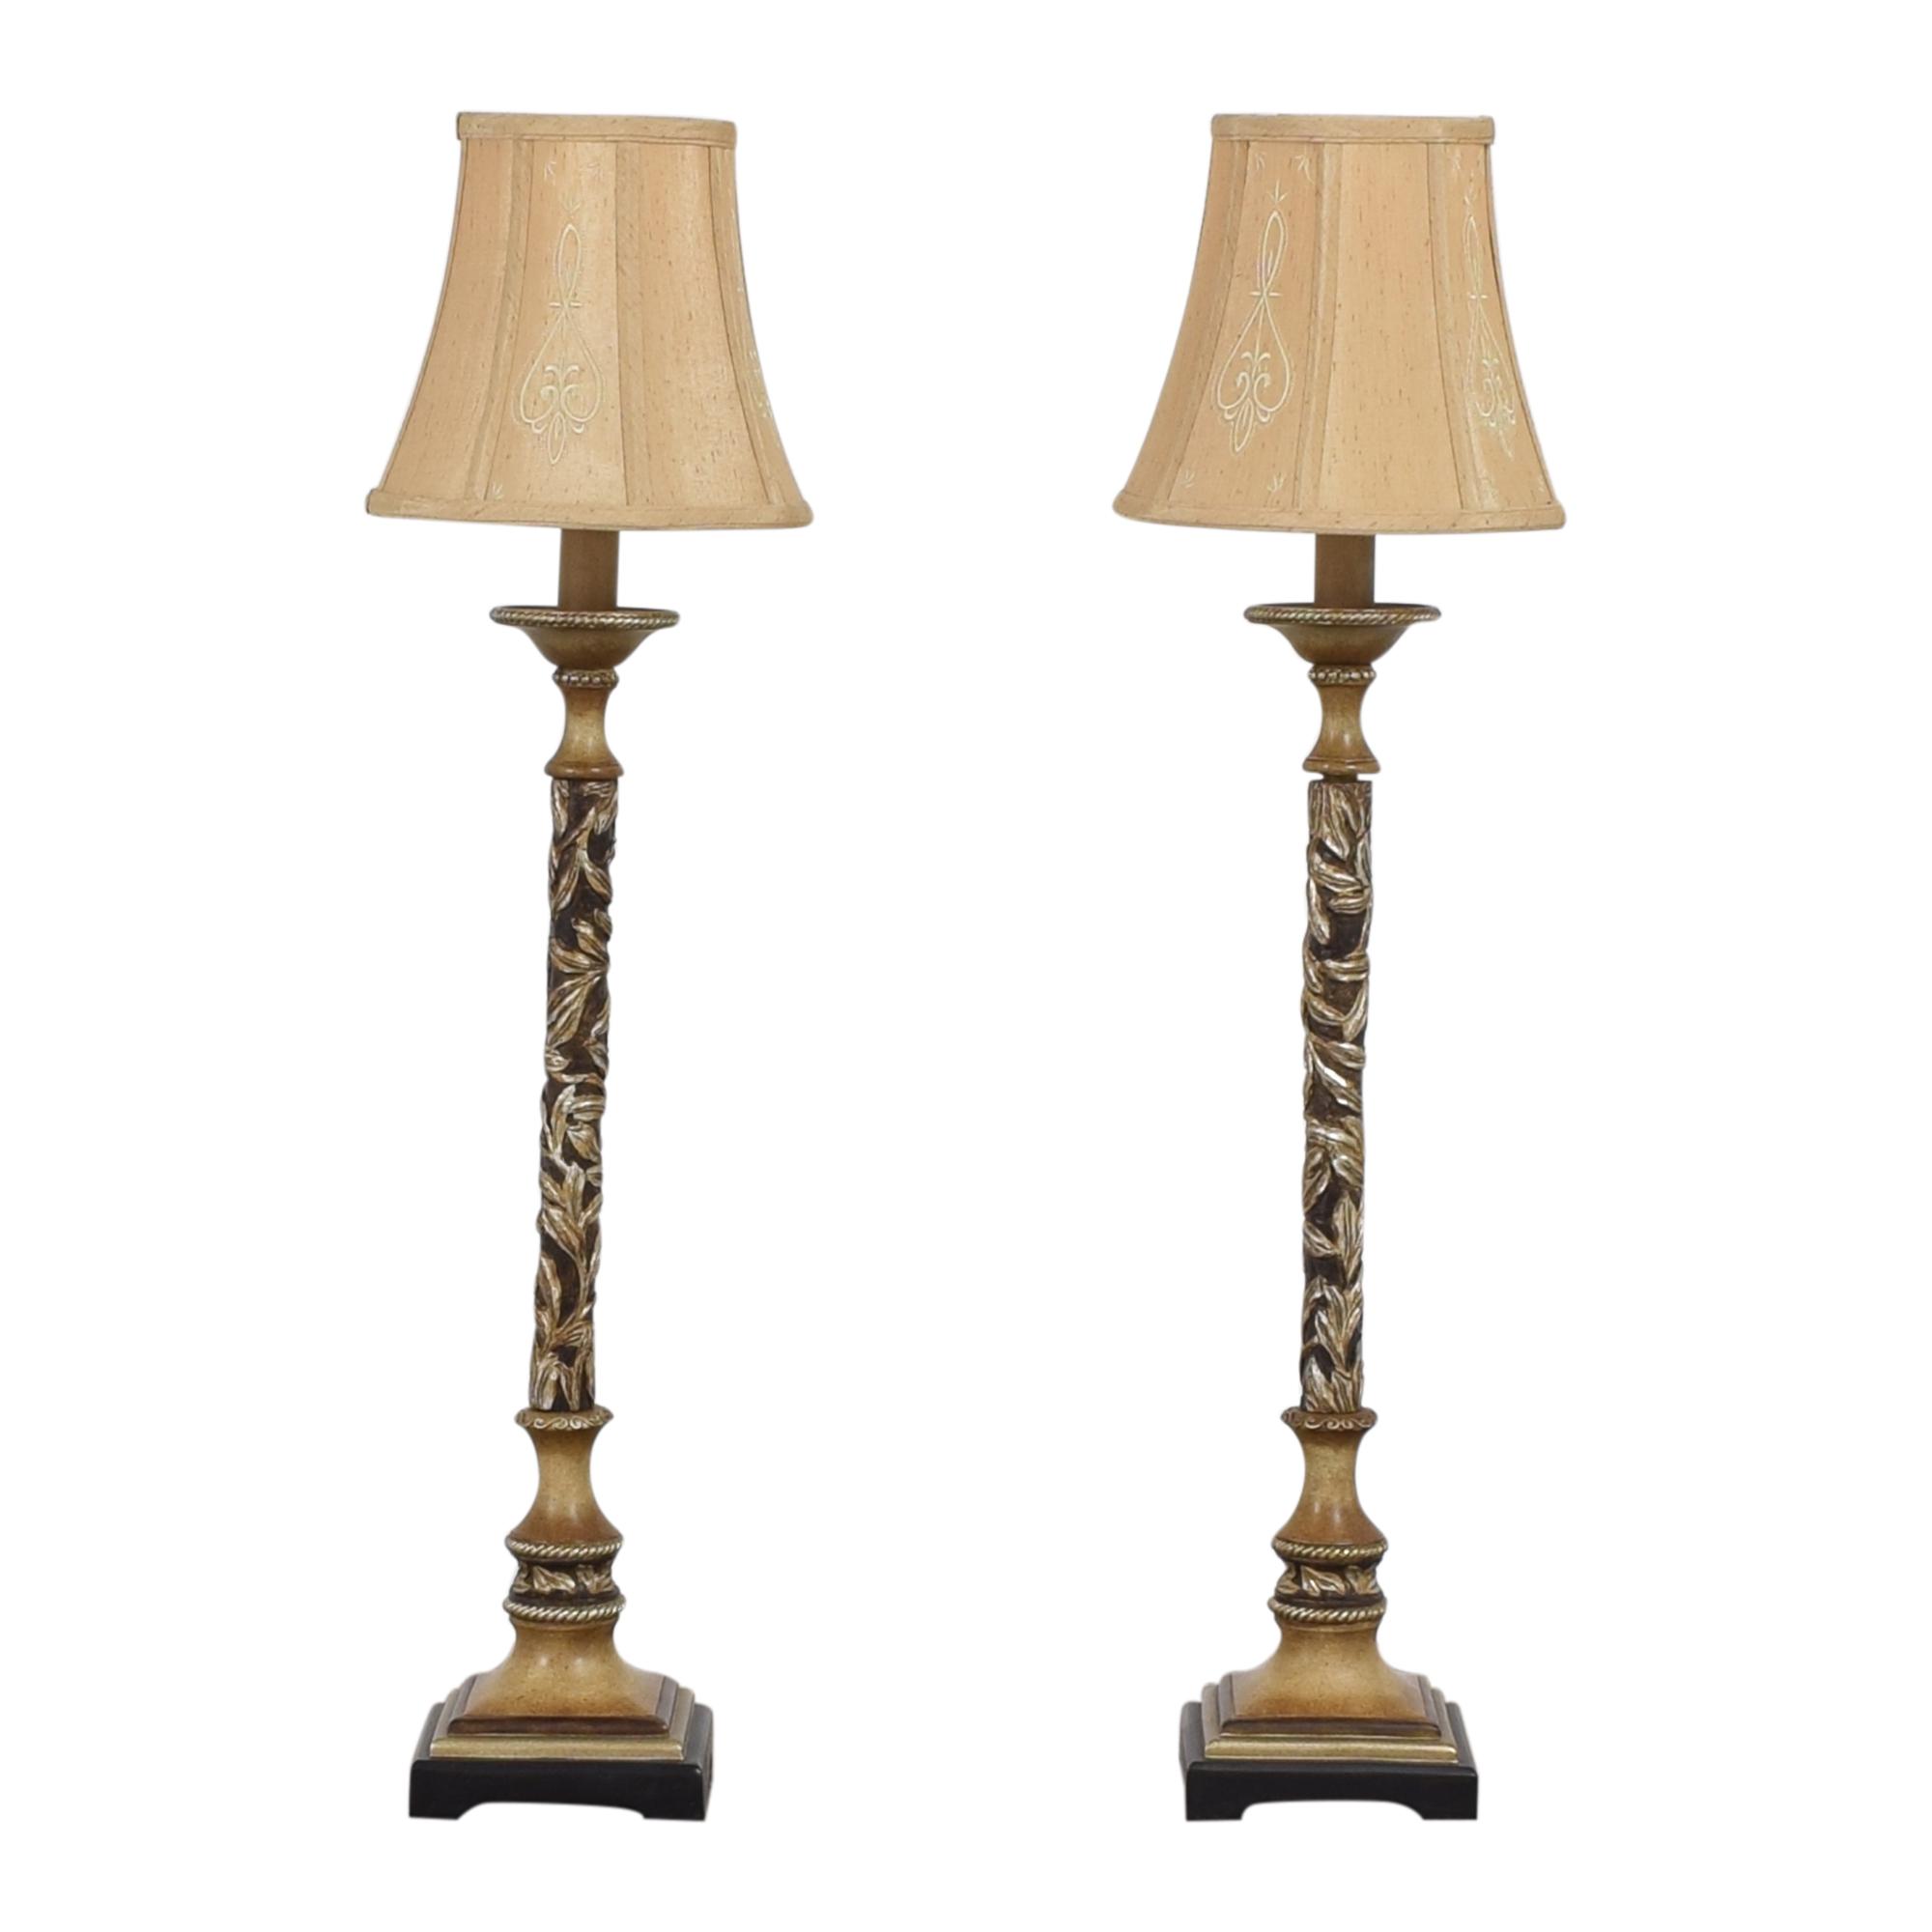 shop Minka Salon Grand Console Table Lamps Minka